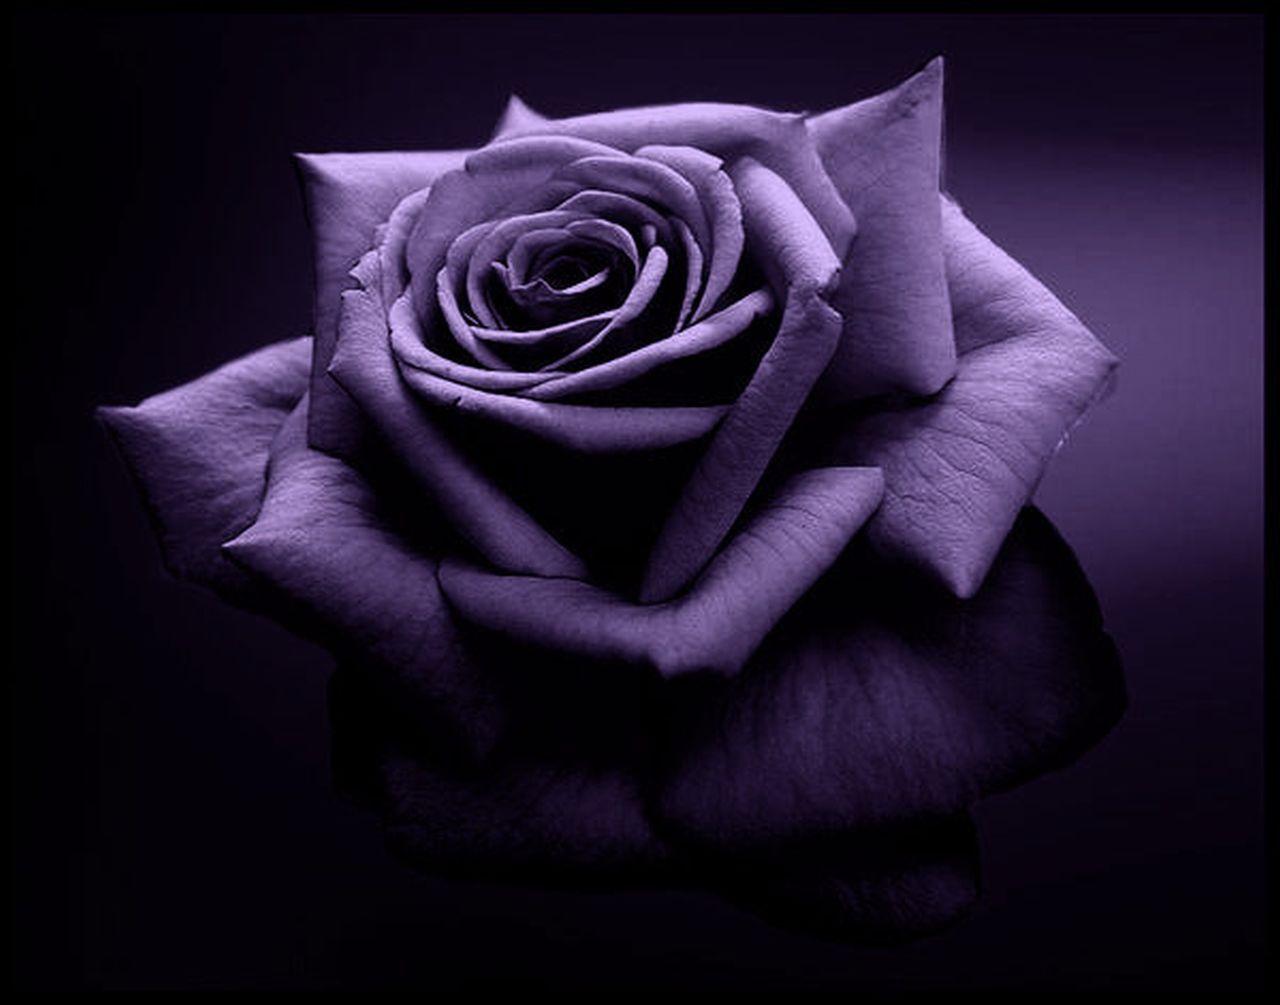 Purple rose purple photo 34727317 fanpop for Purple rose pictures